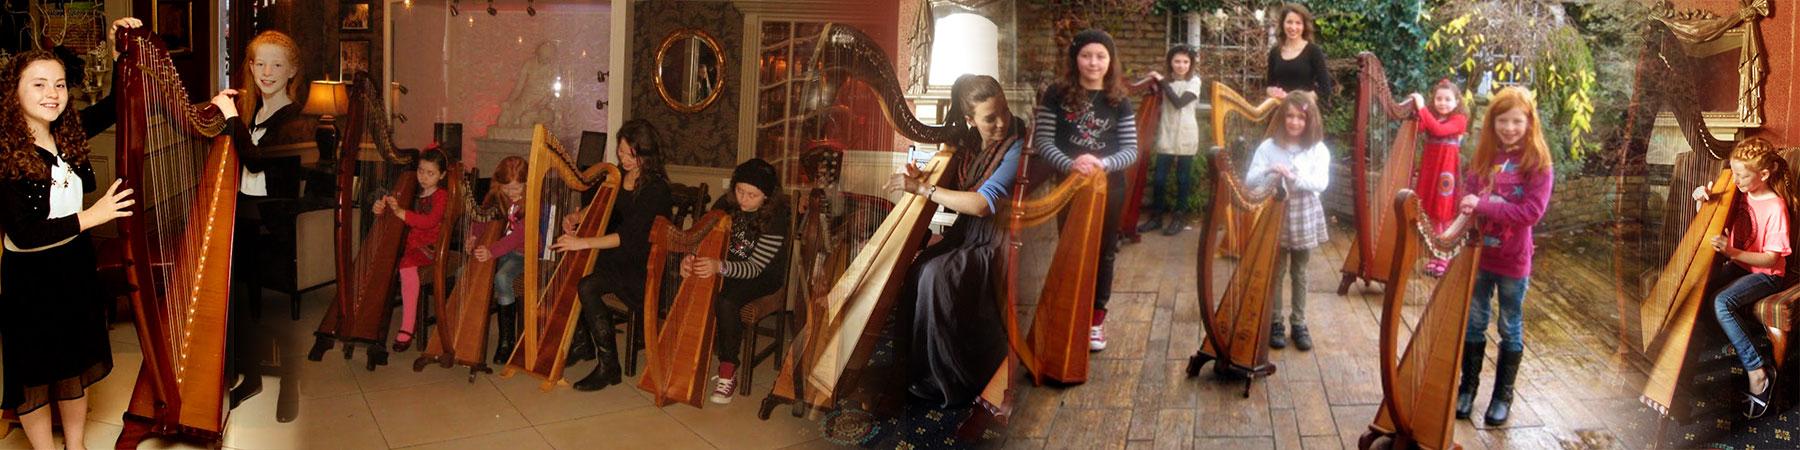 Mullingar Harp School